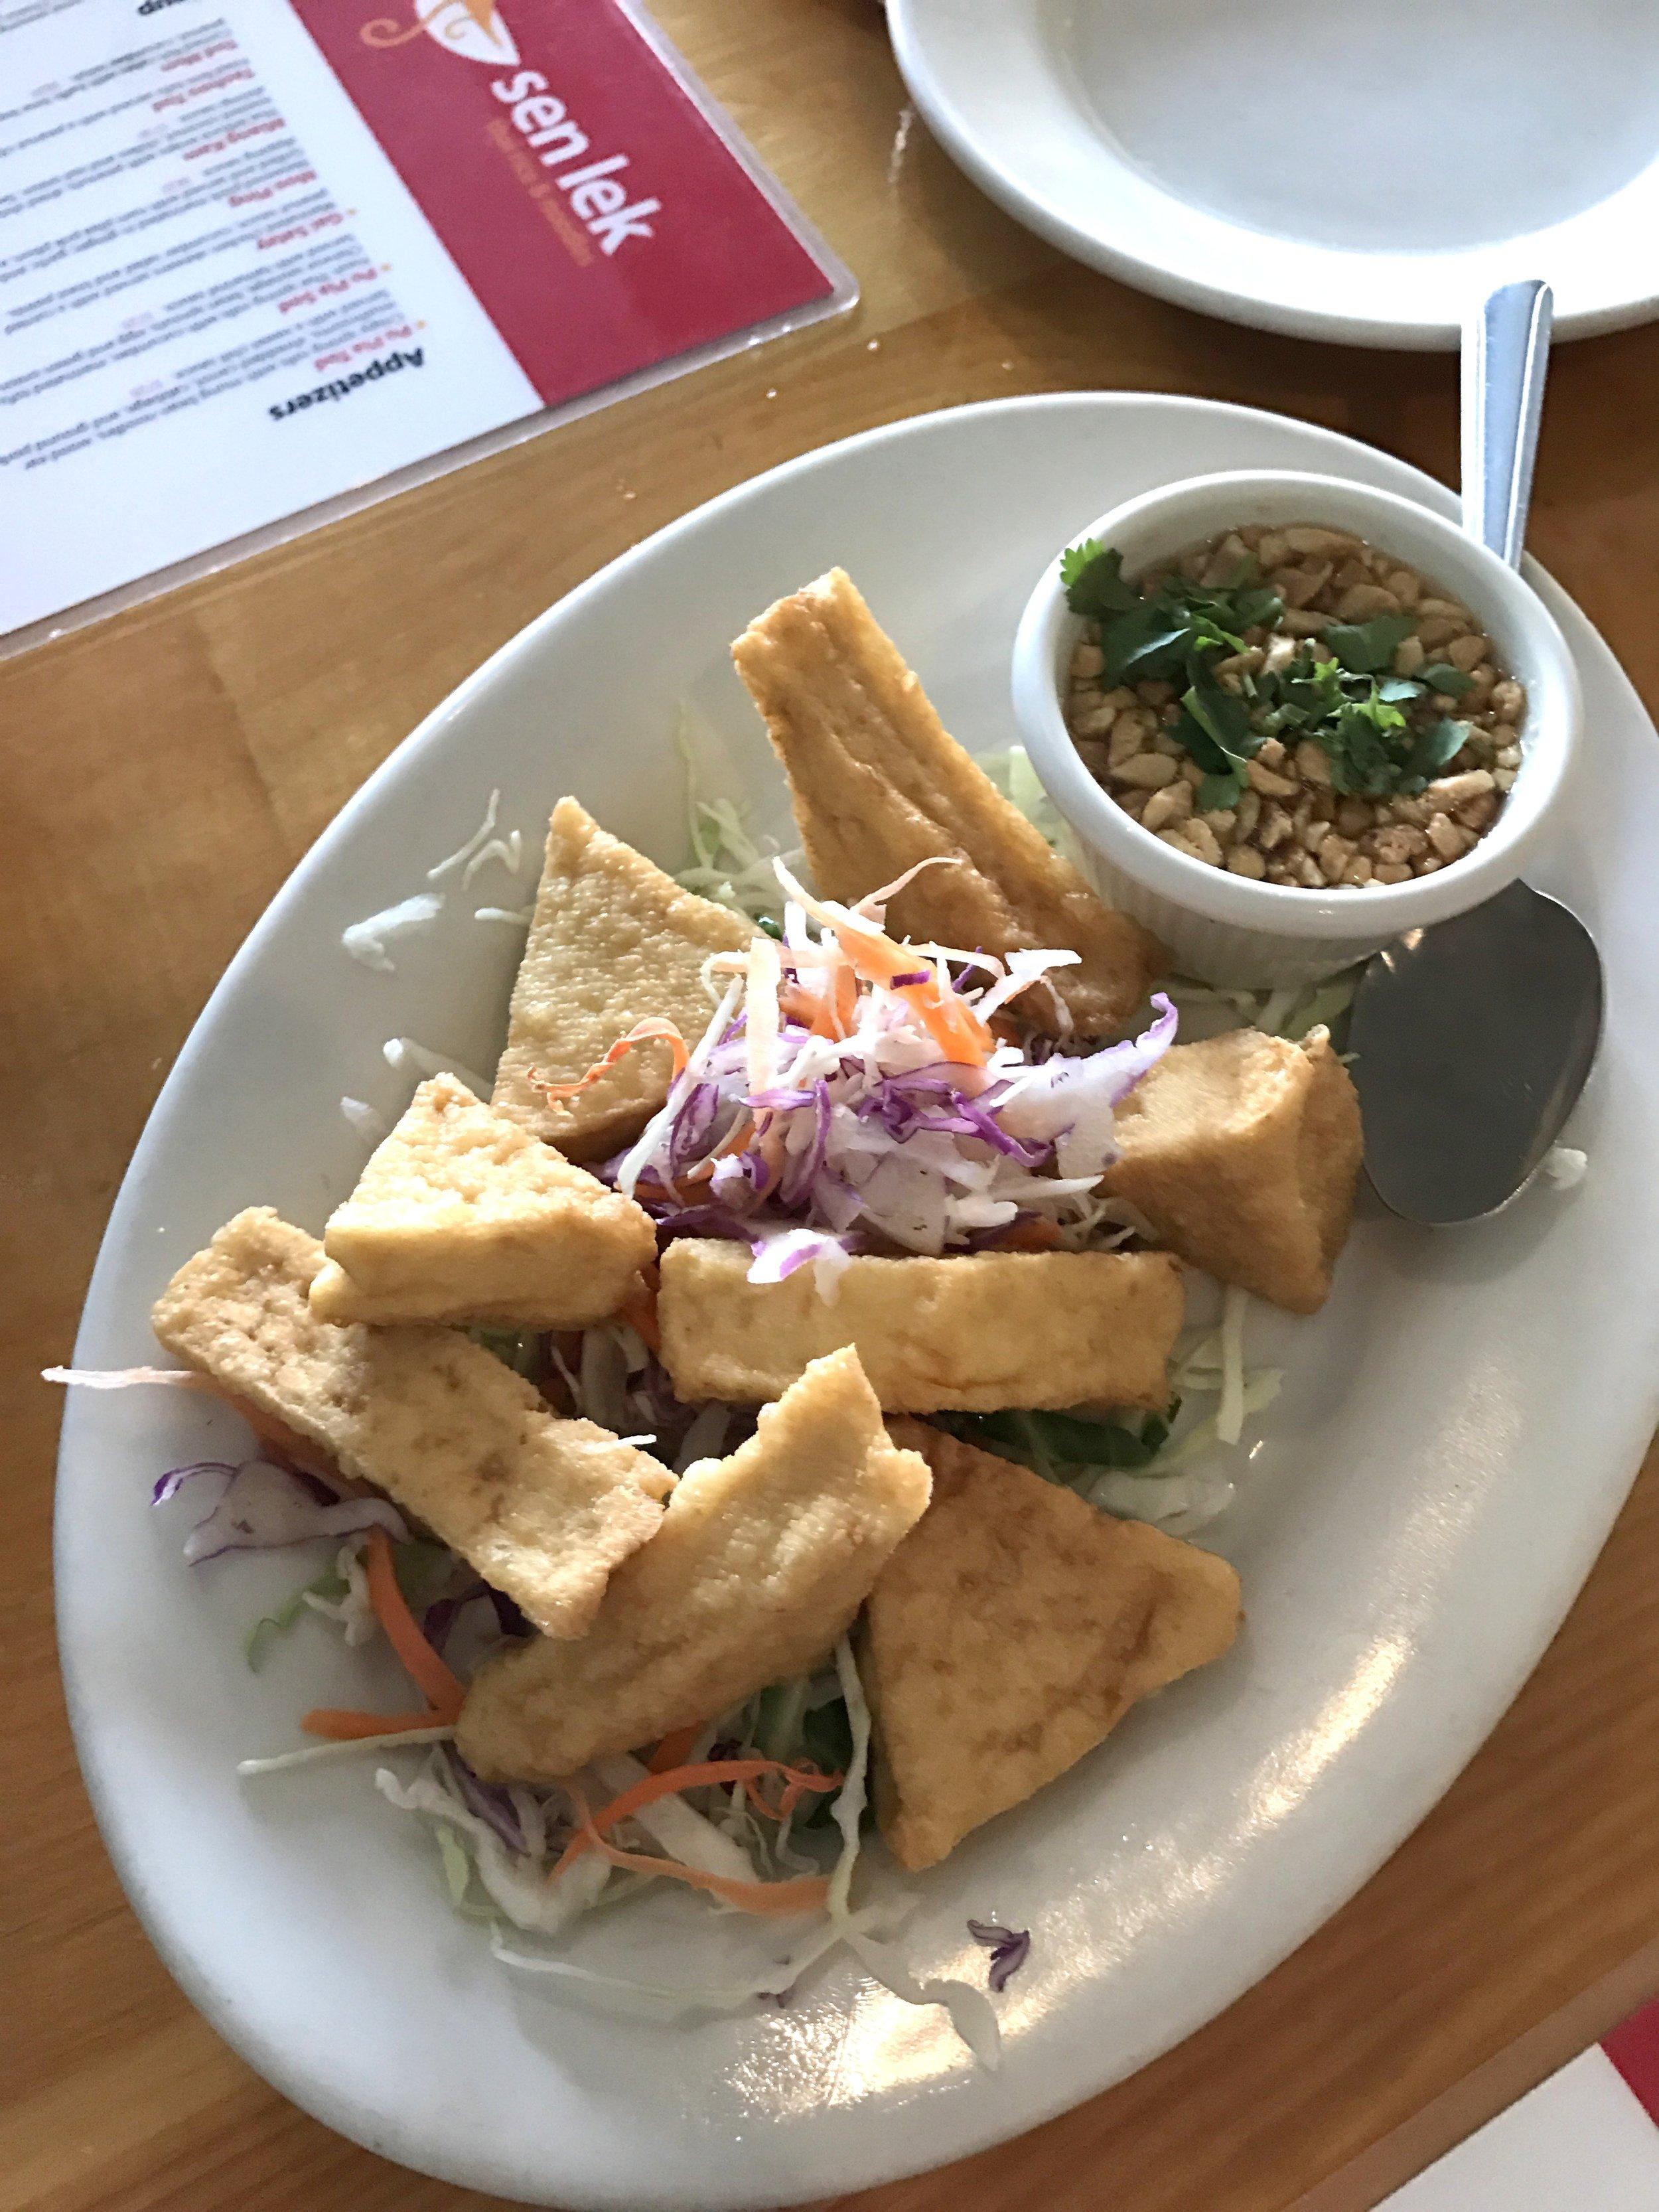 Taohoo Tod: Fried firm tofu with a peanut cilantro chili sauce